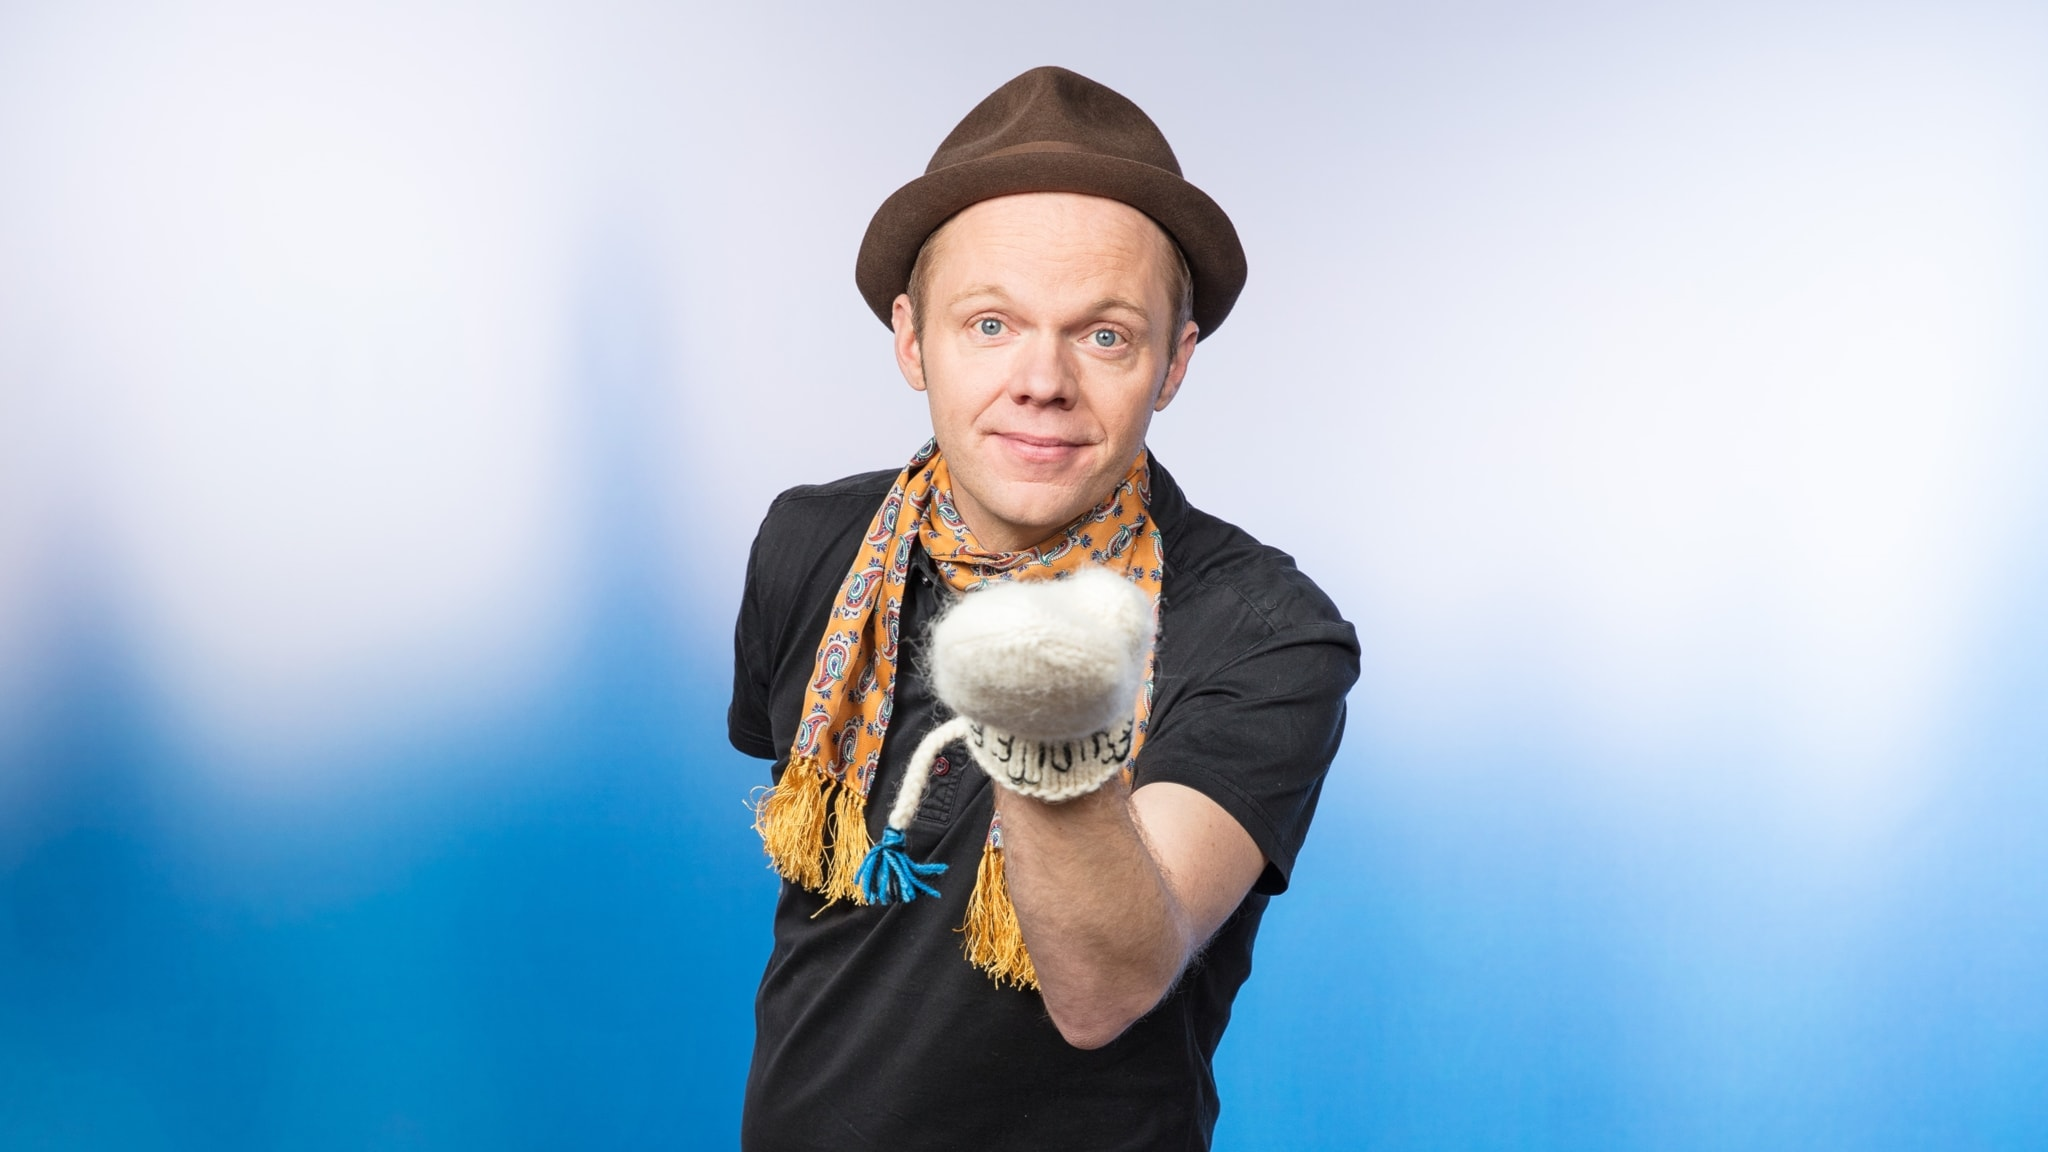 Olof Wretling - Vinter 2017